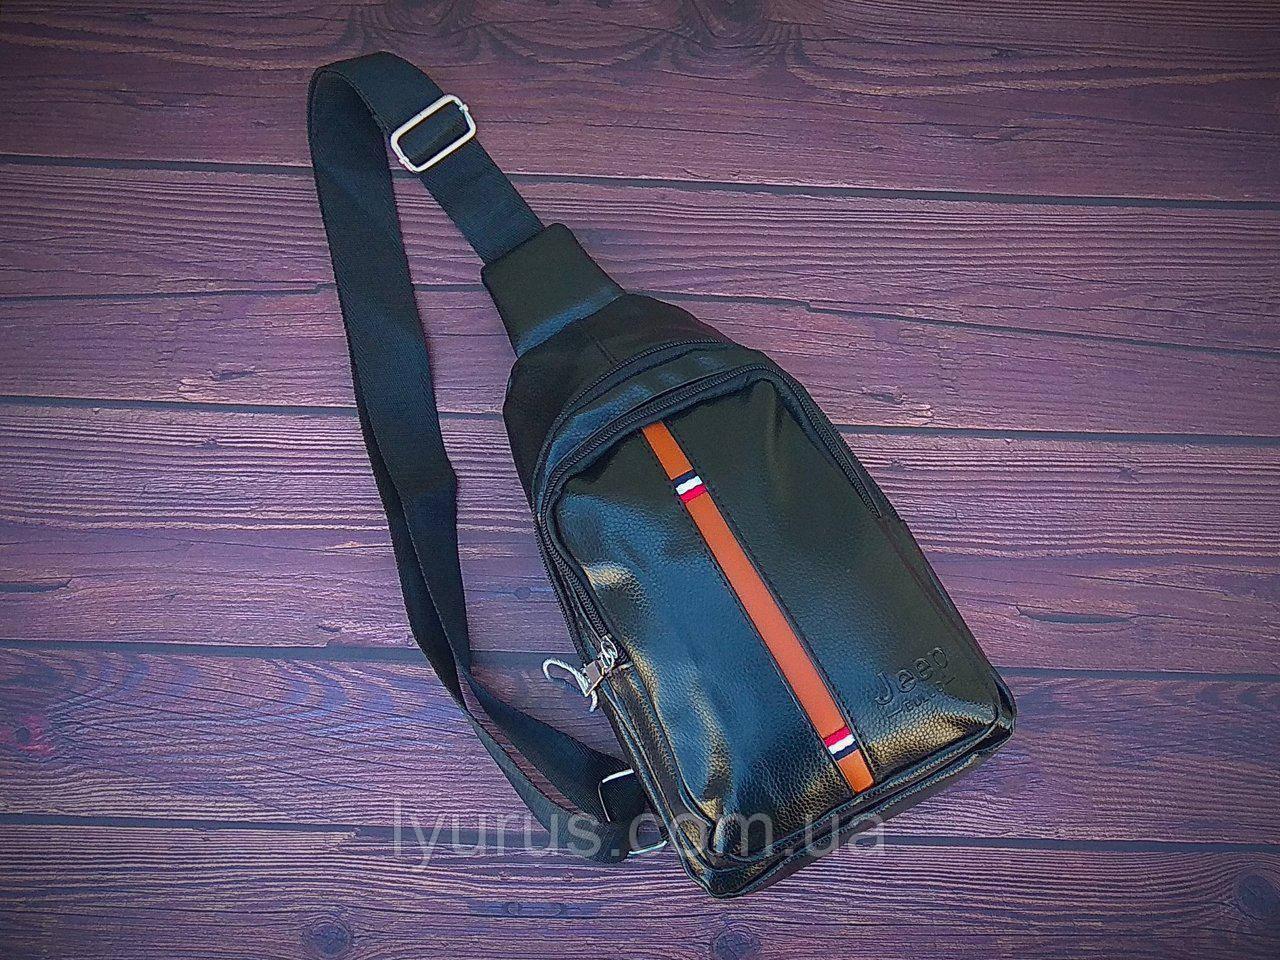 Сумка-рюкзак на одно плечо, кобура, слинг Jeep. Черная